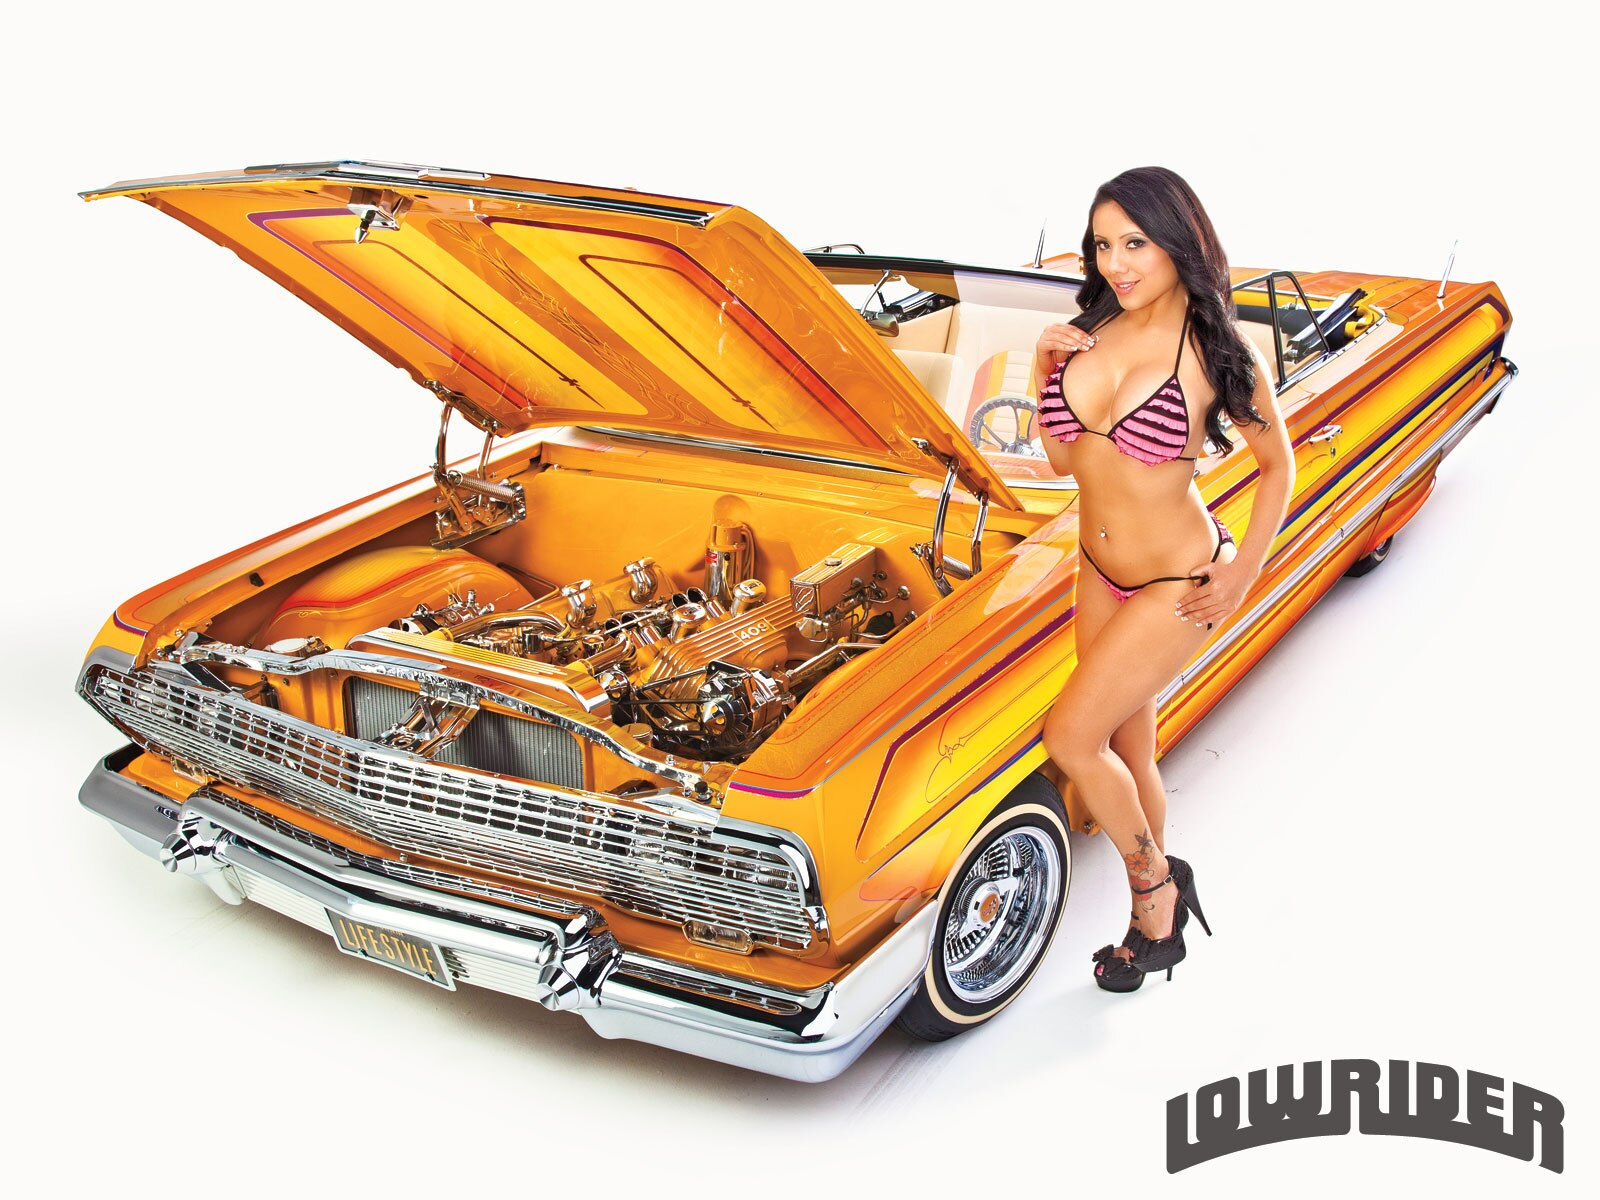 1212-lrmp-01-o-editors-letter-convertible-lowrider1